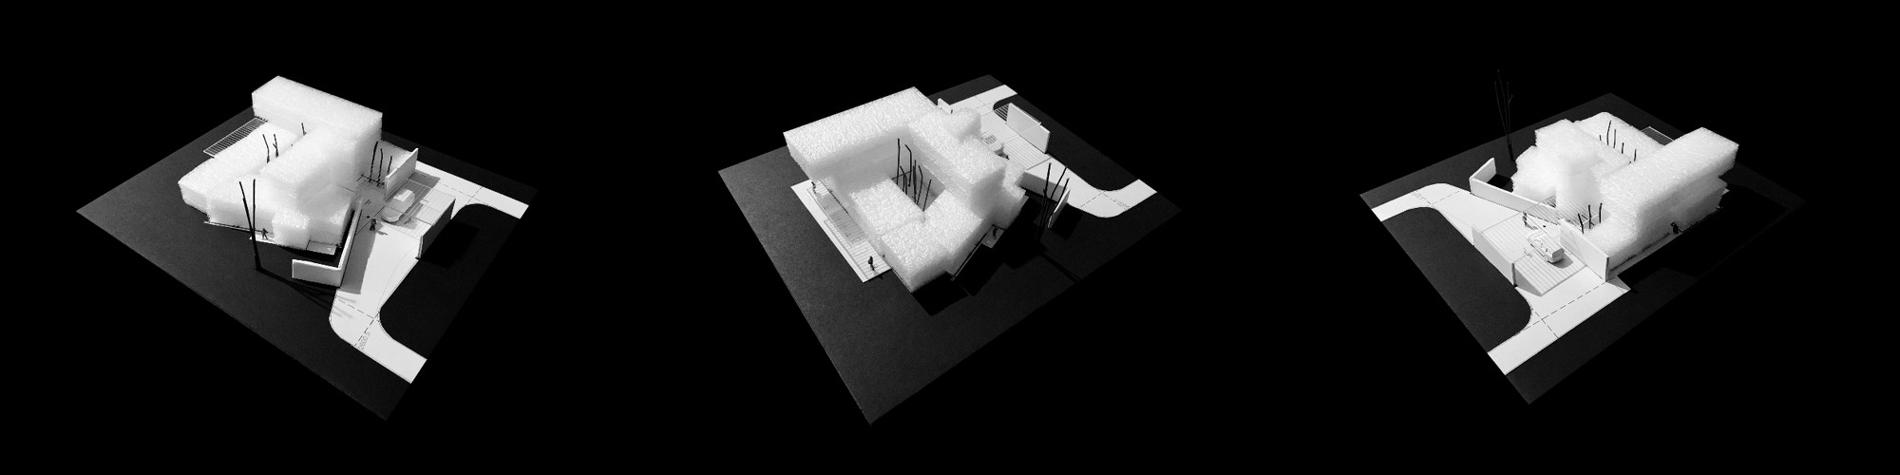 Maqueta proyectos David Macias